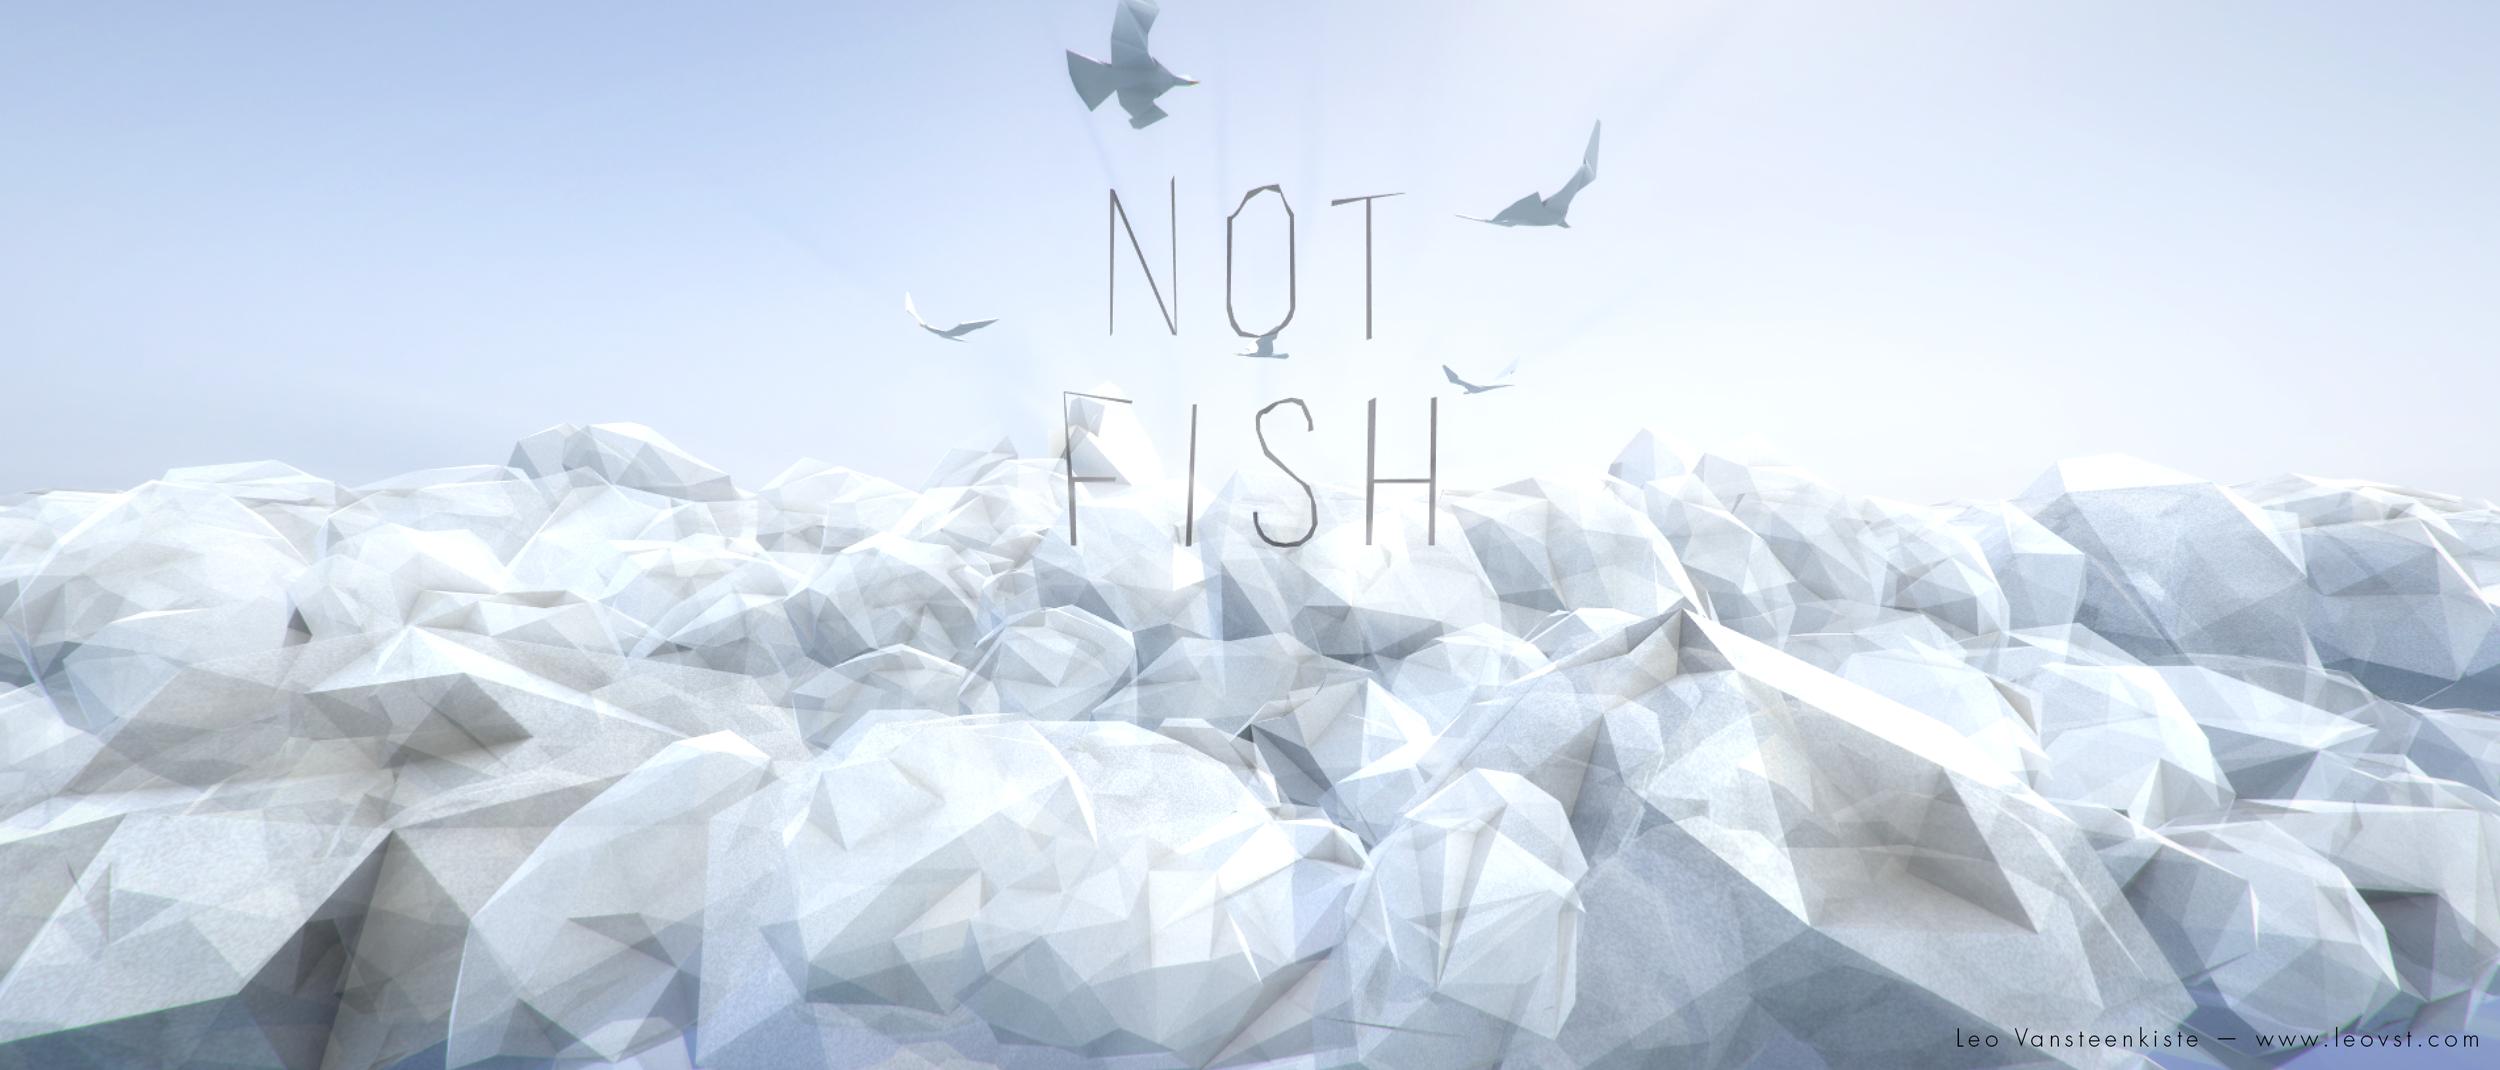 Not Fish Intro